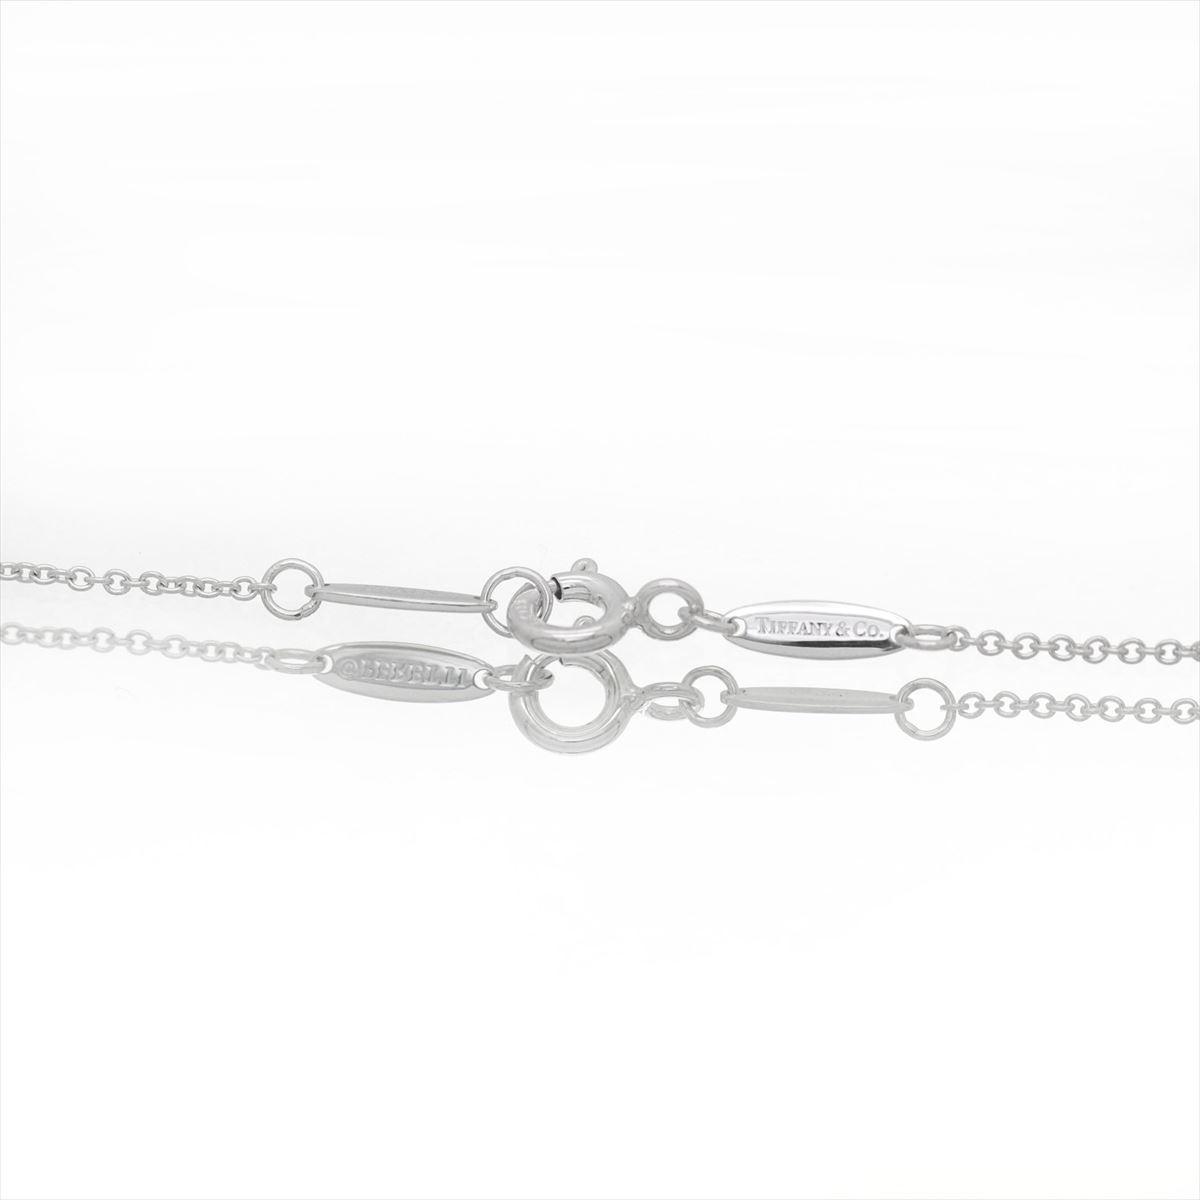 Karyon rakuten global market tiffany amp co tiffany open heart tiffany open heart elsa peretti silver sv925 necklace womens feminine aloadofball Choice Image